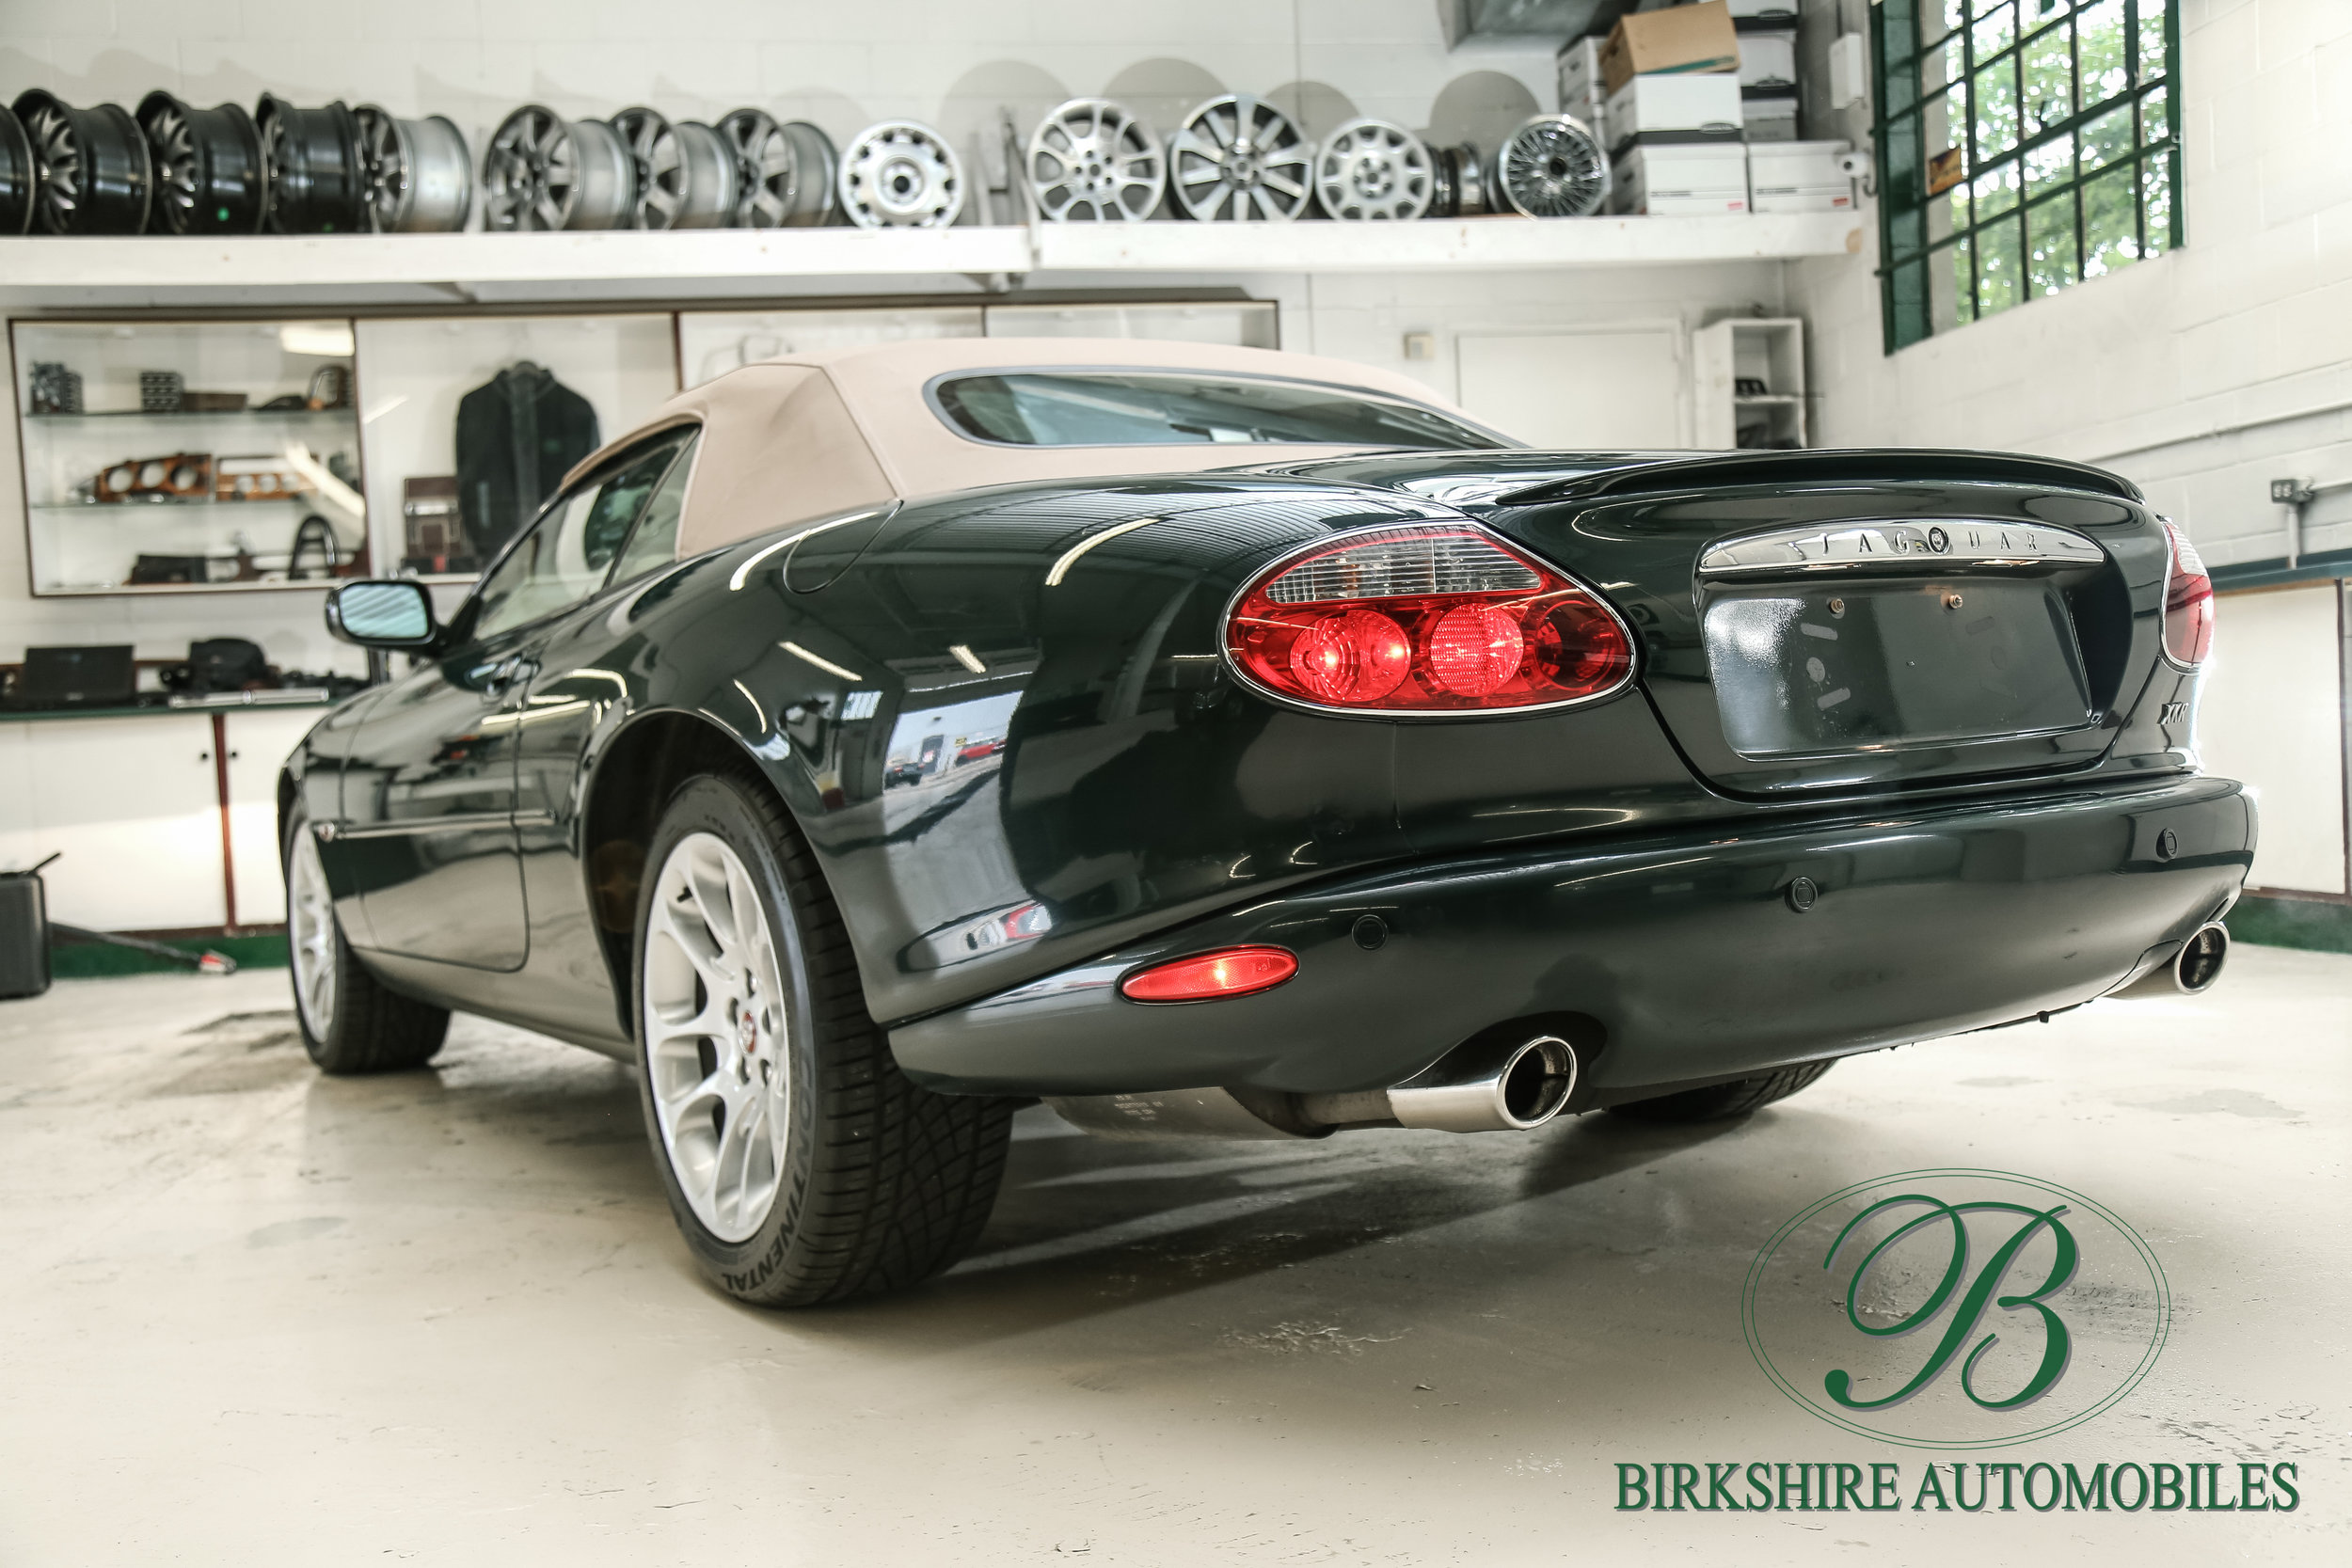 Birkshire Automobiles-108.jpg